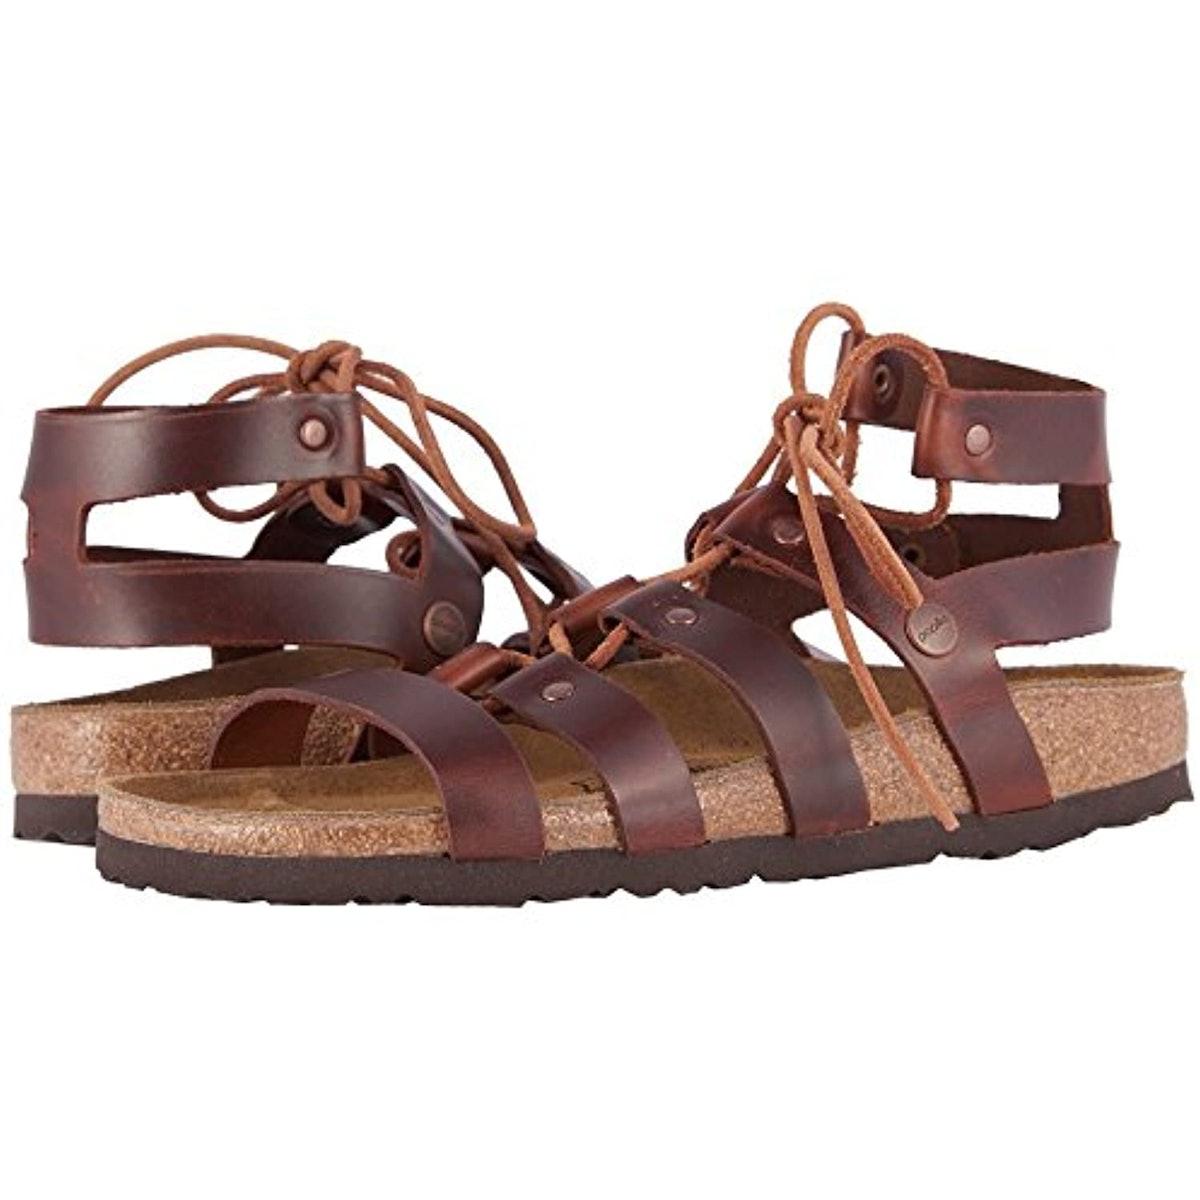 Birkenstock Papillio Cleo Leather Sandals